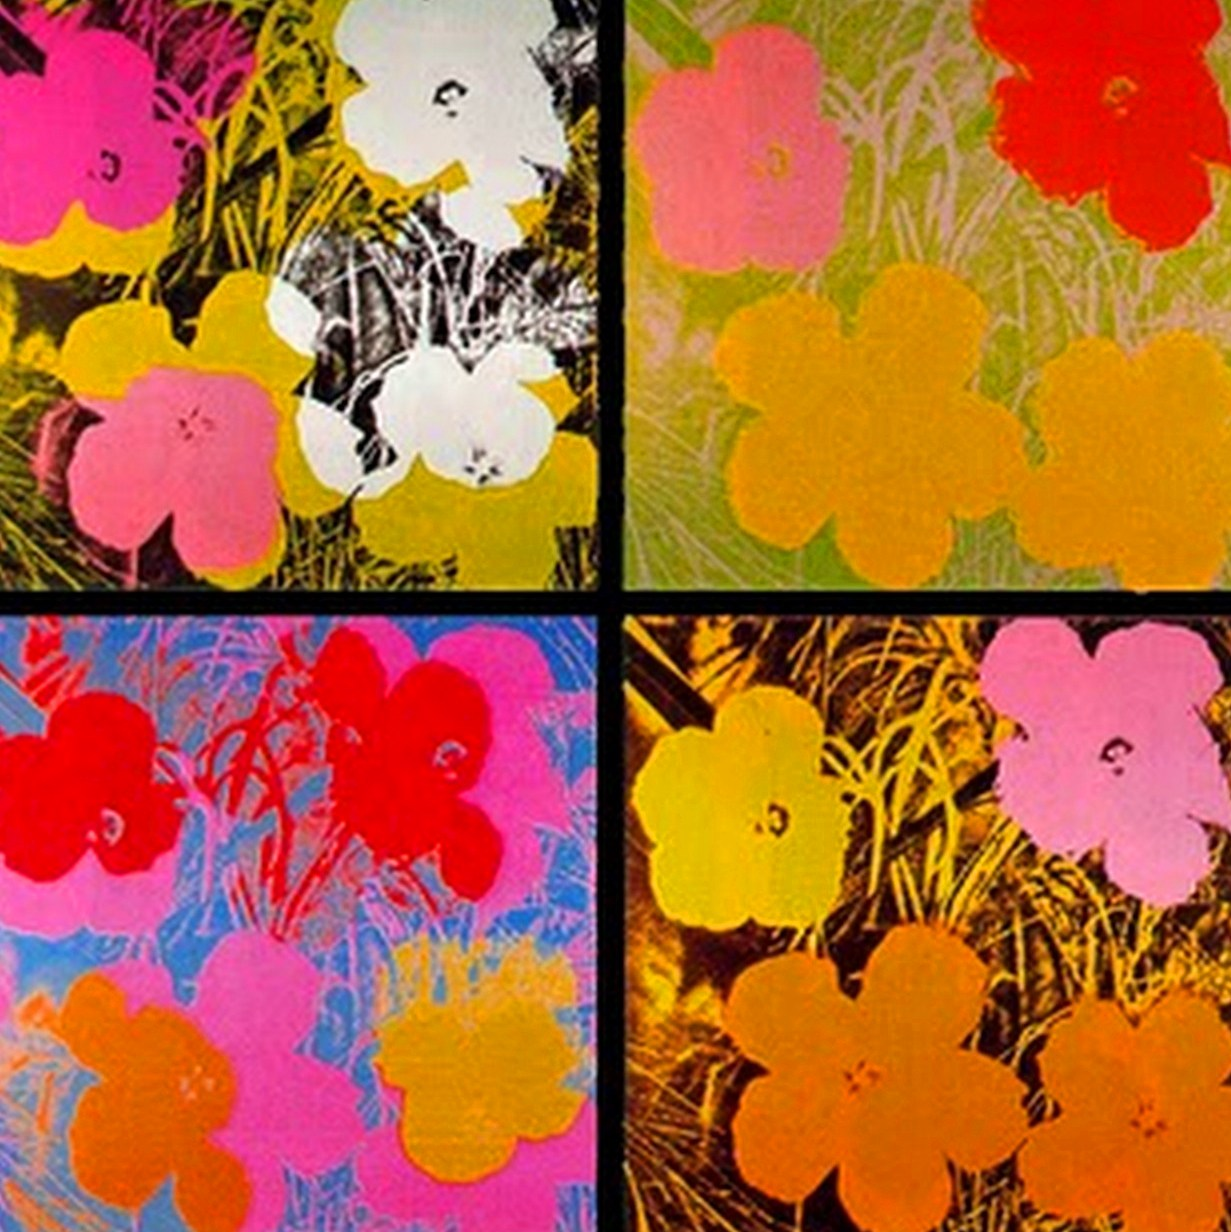 Pinturas cuadros lienzos cuadros de arte pop famosos - Cuadros de pintura ...